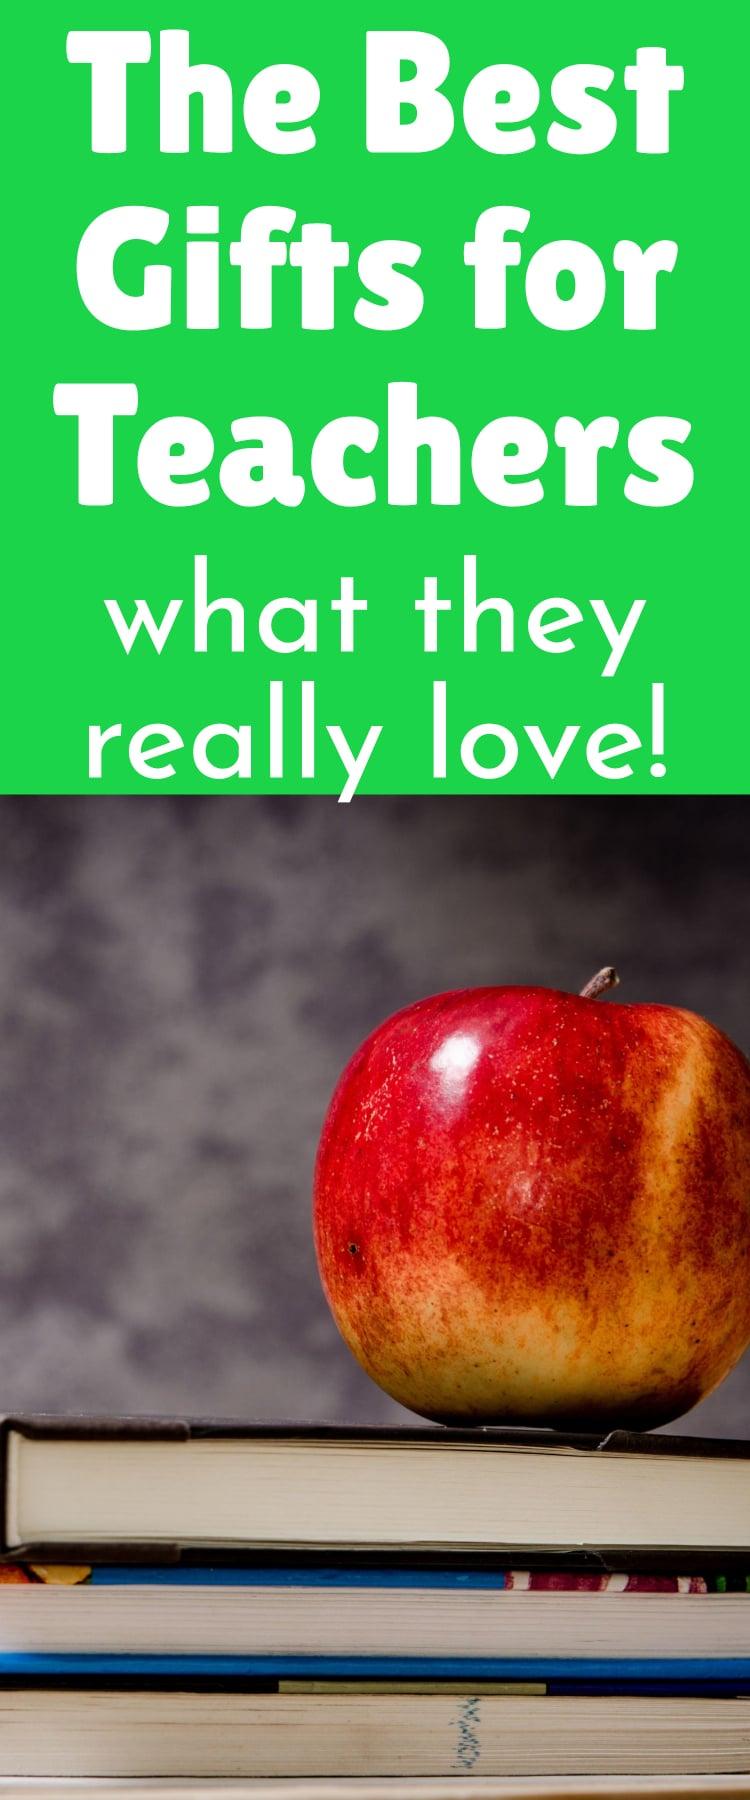 gift ideas for teachers / teacher gifts / teacher appreciation / gifts for teachers / teacher gift ideas / #teachers #education #educators #teachergifts #teacherappreciation #gift #giftideas #gifts #teacher #appreciation #endofschool  via @clarkscondensed